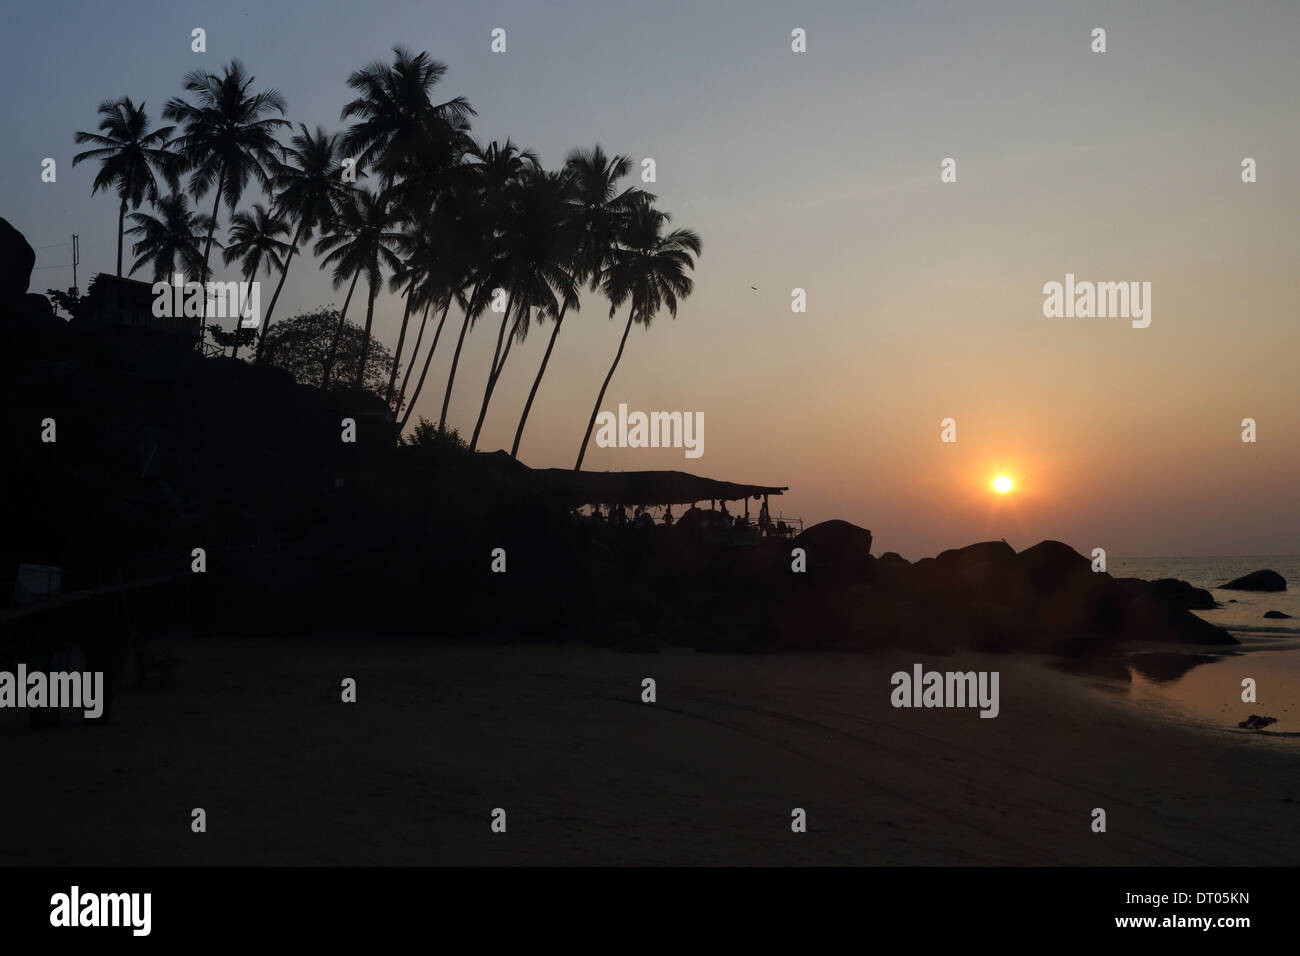 Palolem beach en Goa, India, Sur de la India Foto: pixstory / Alamy Imagen De Stock